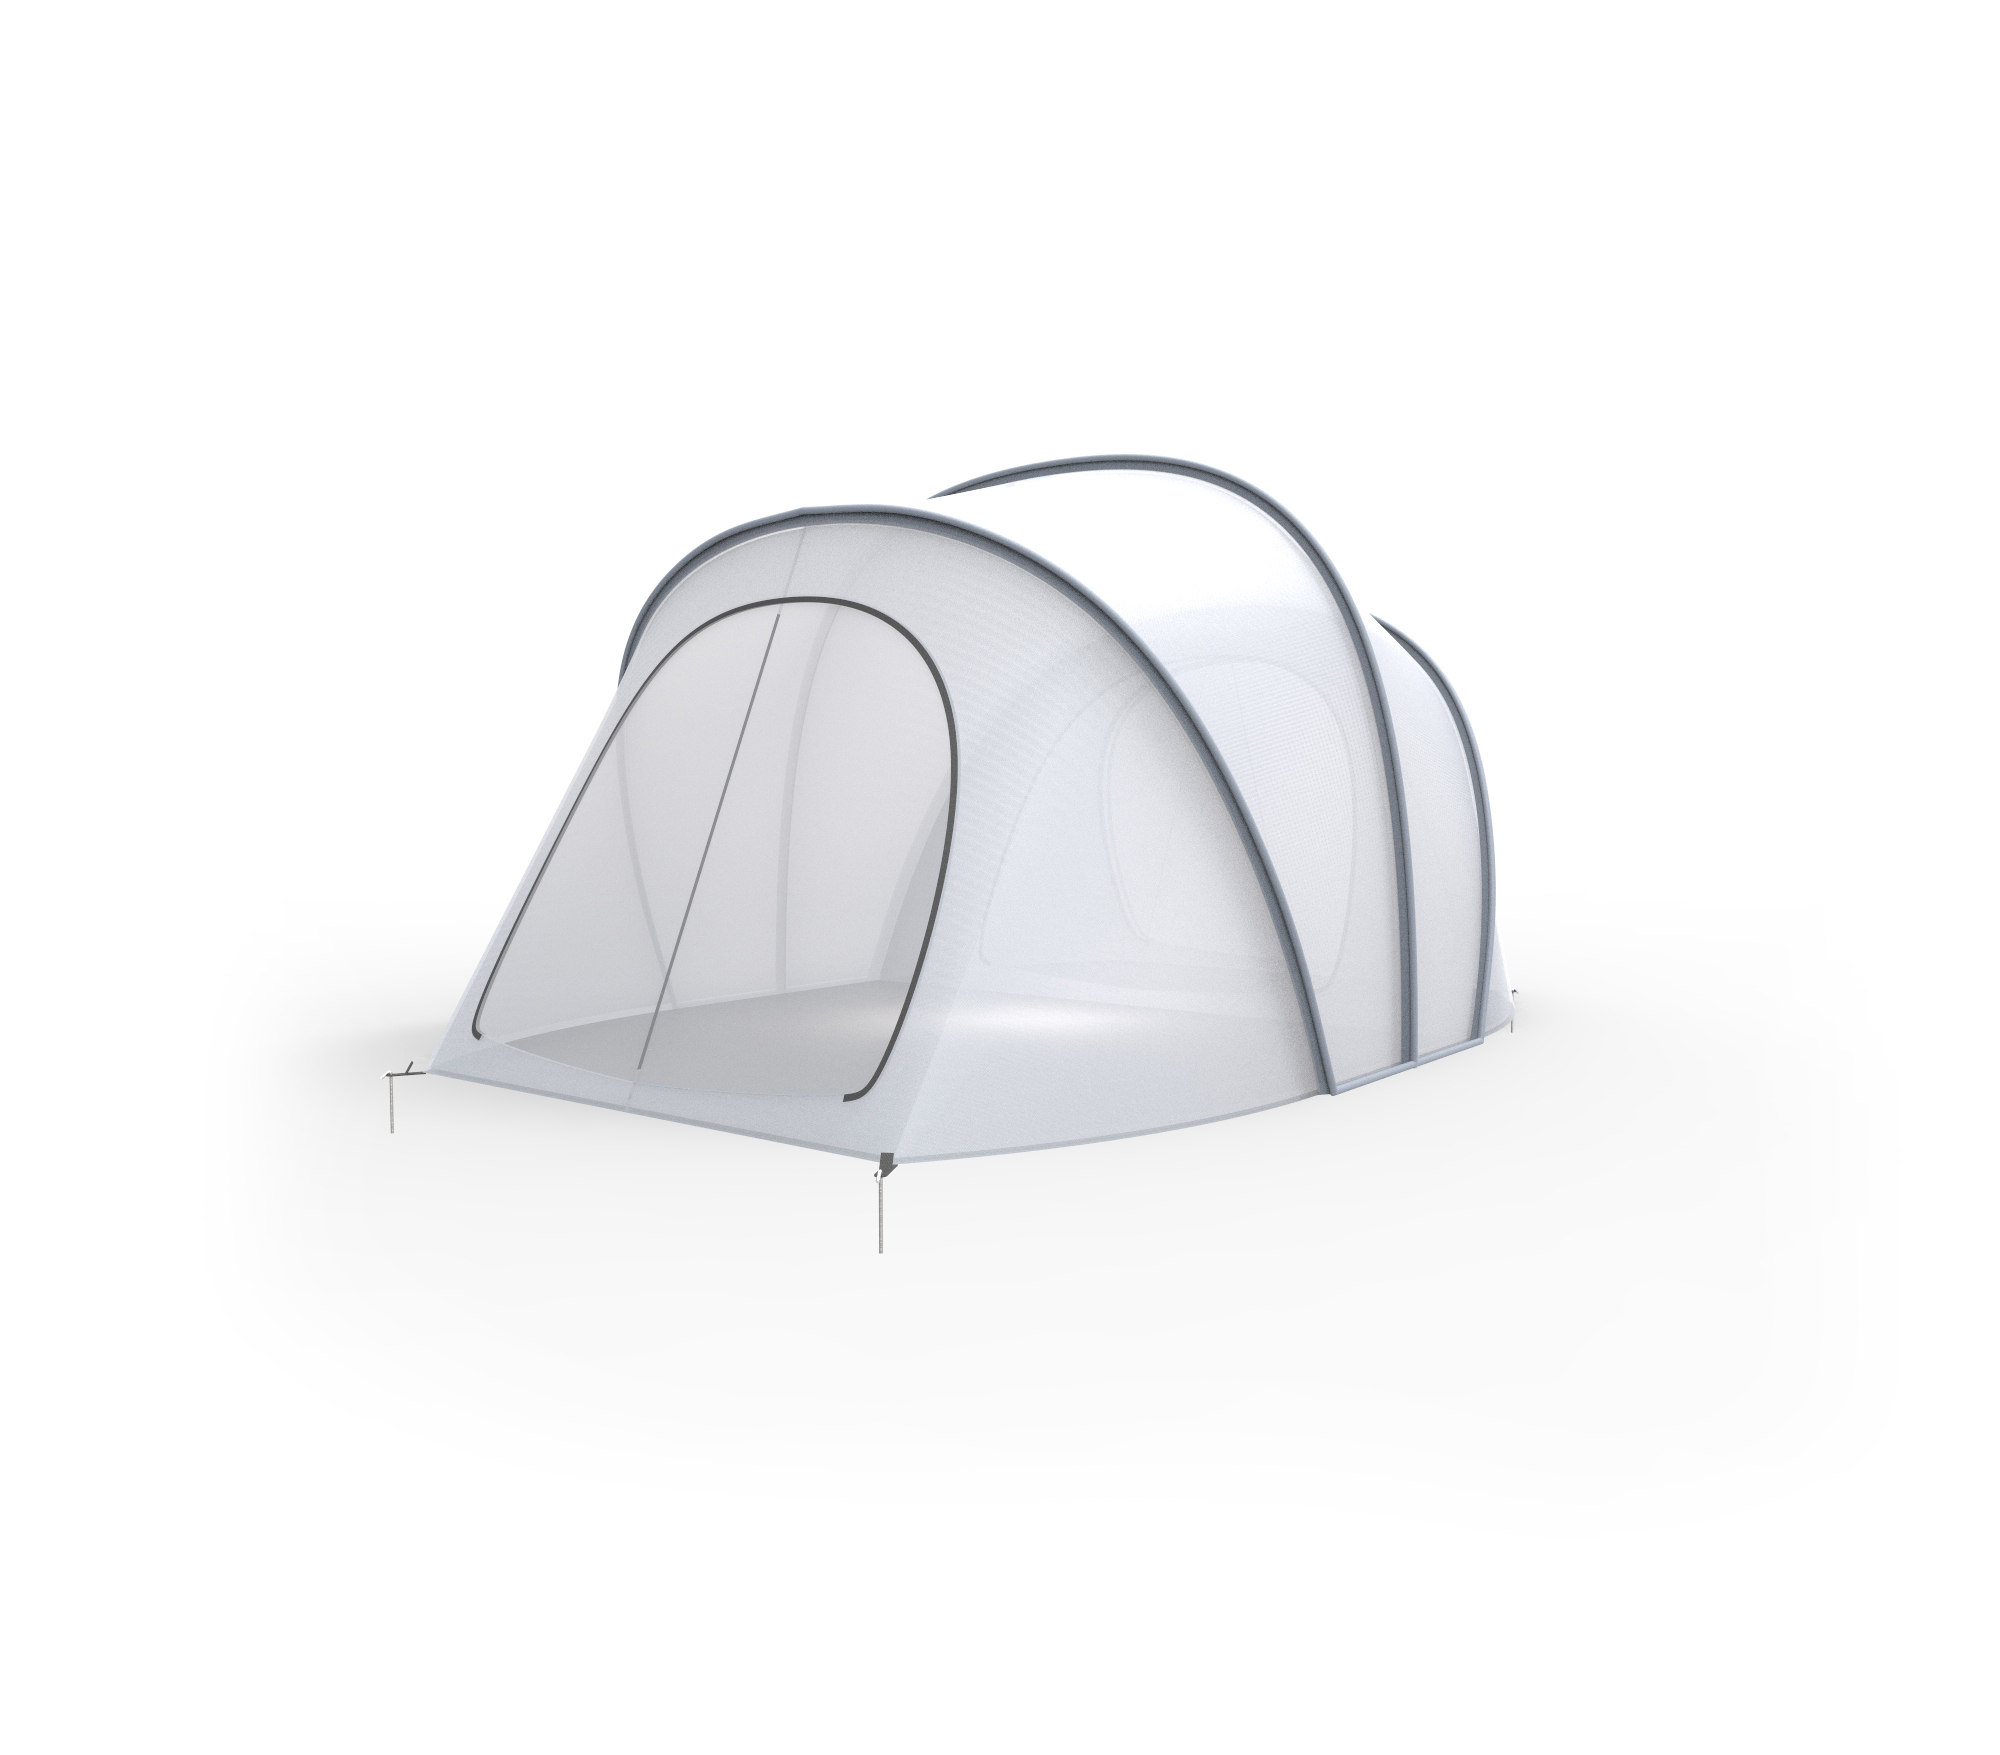 tents.17.jpg